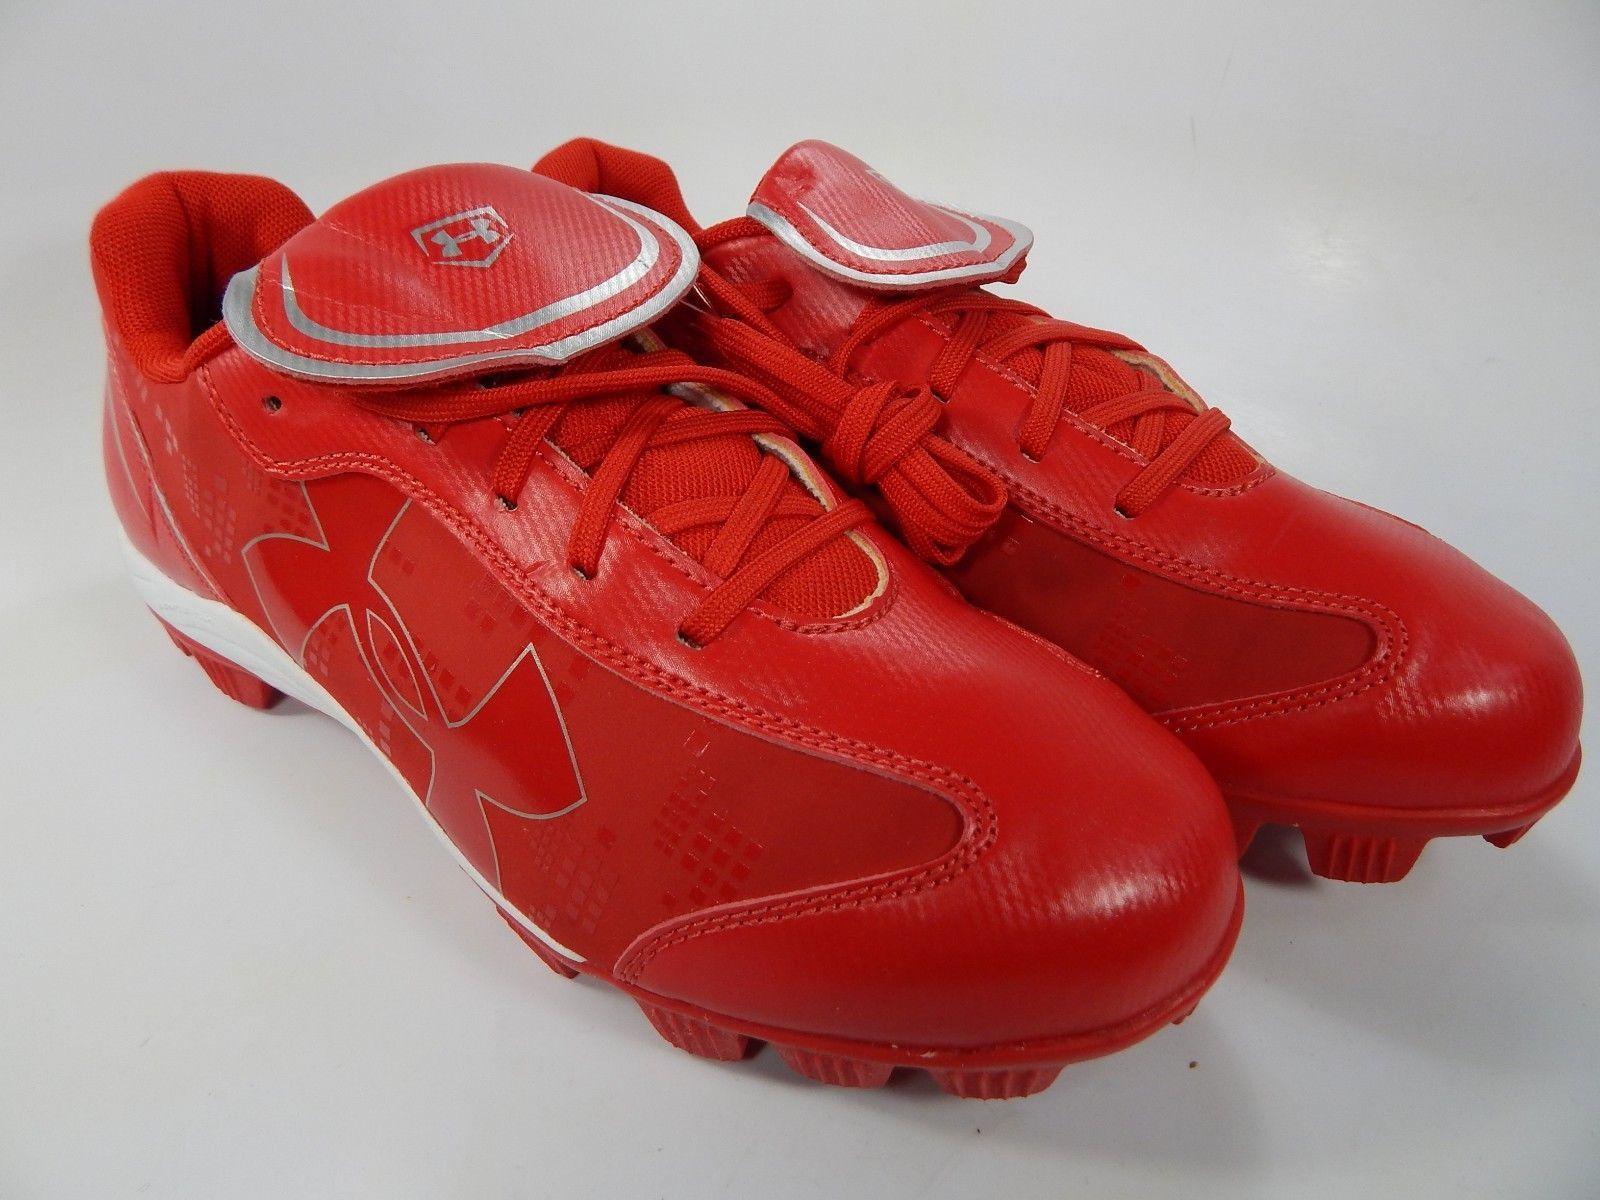 Under Armour Glyde RM CC Size US 7 M EU 38 Women's Softball Cleats 1233552-611